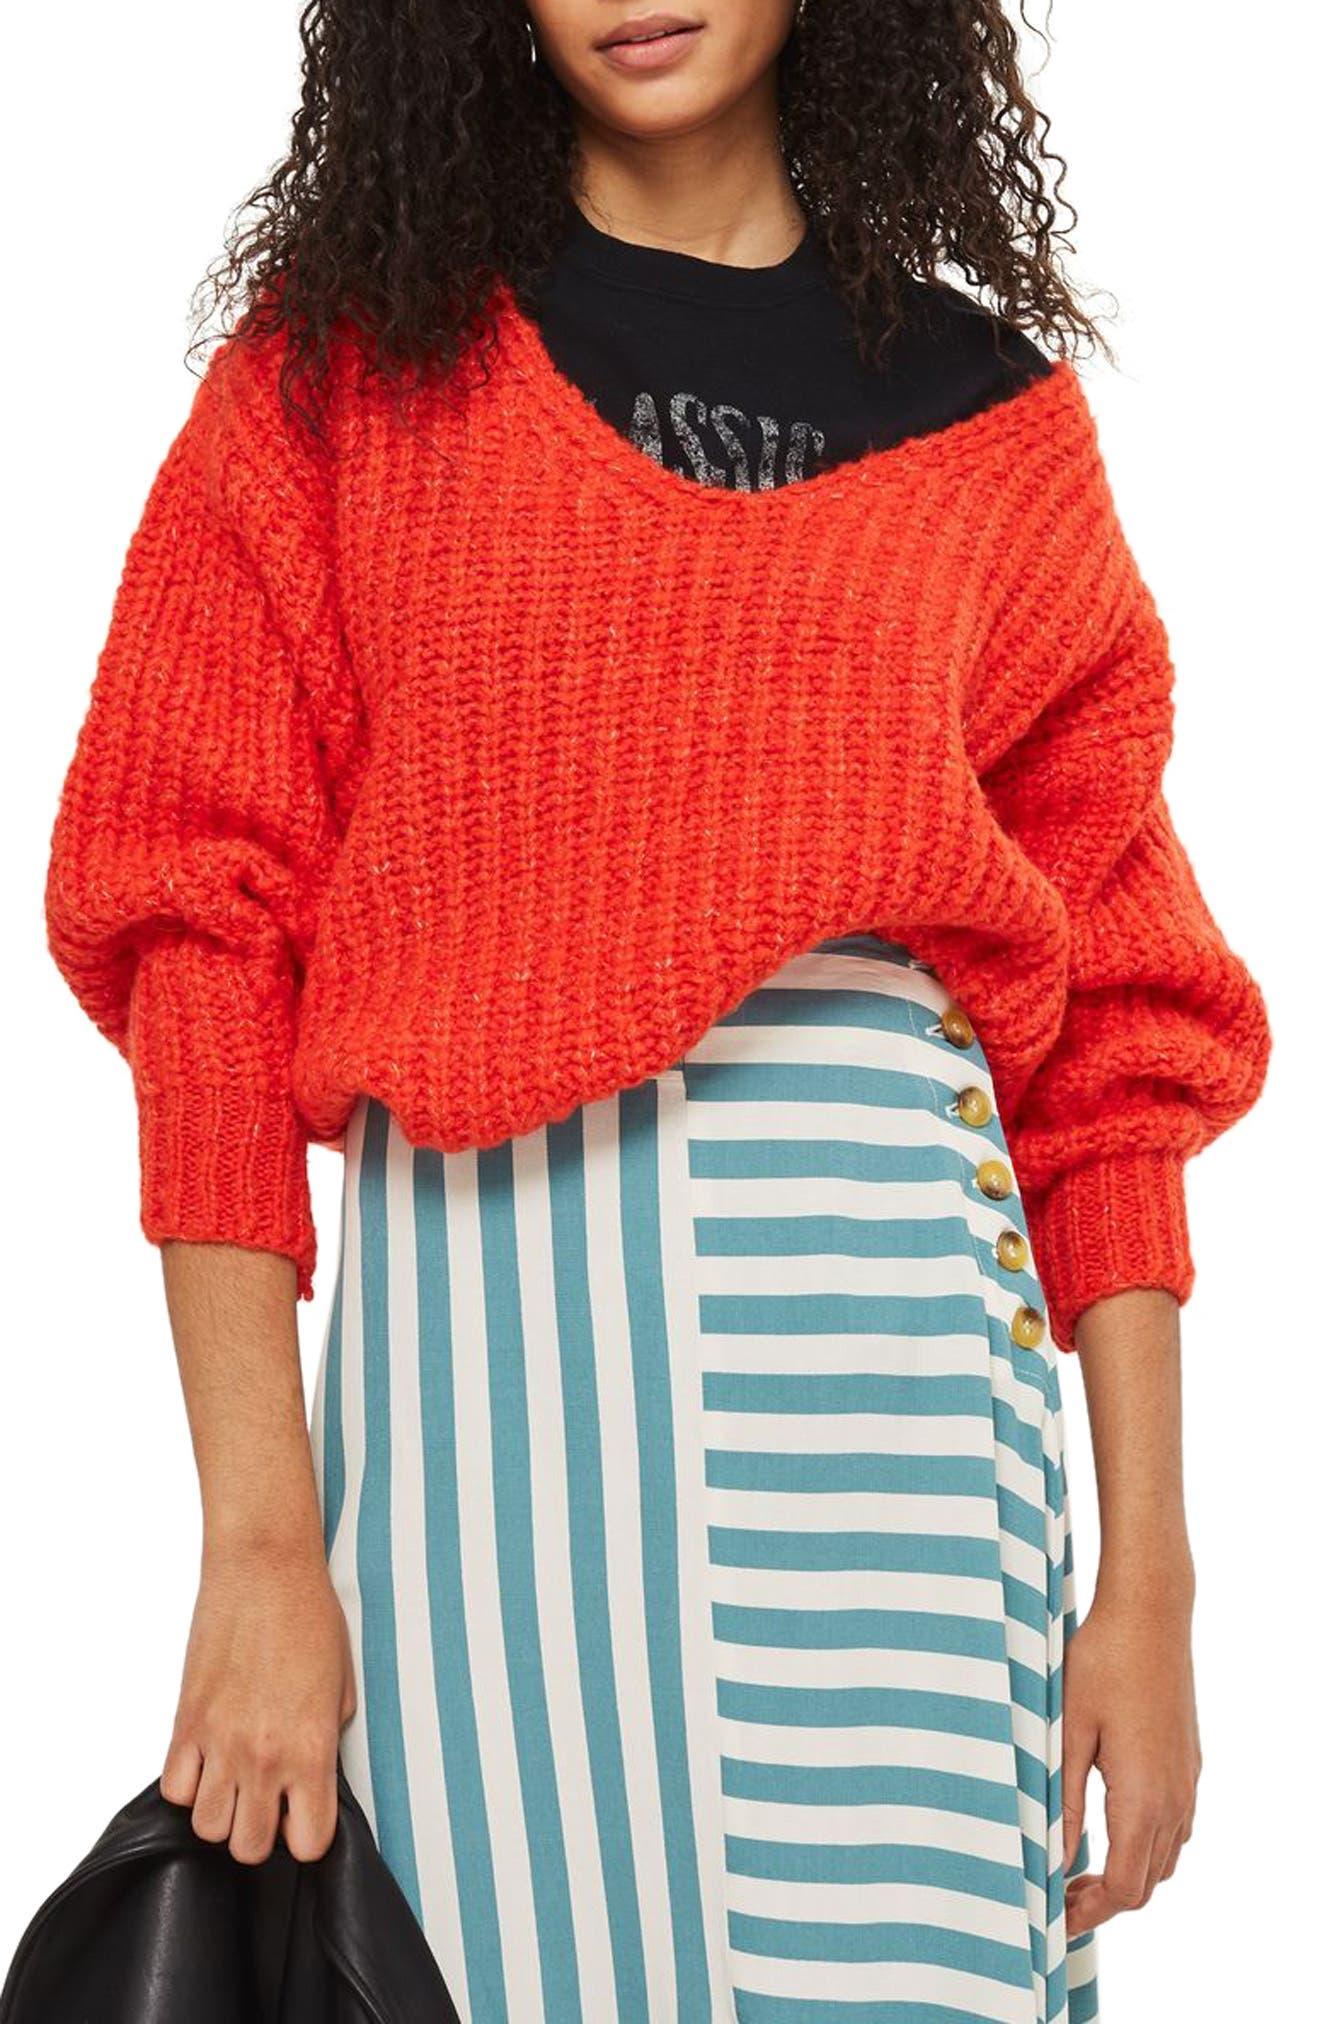 Topshop Oversized V-Neck Sweater